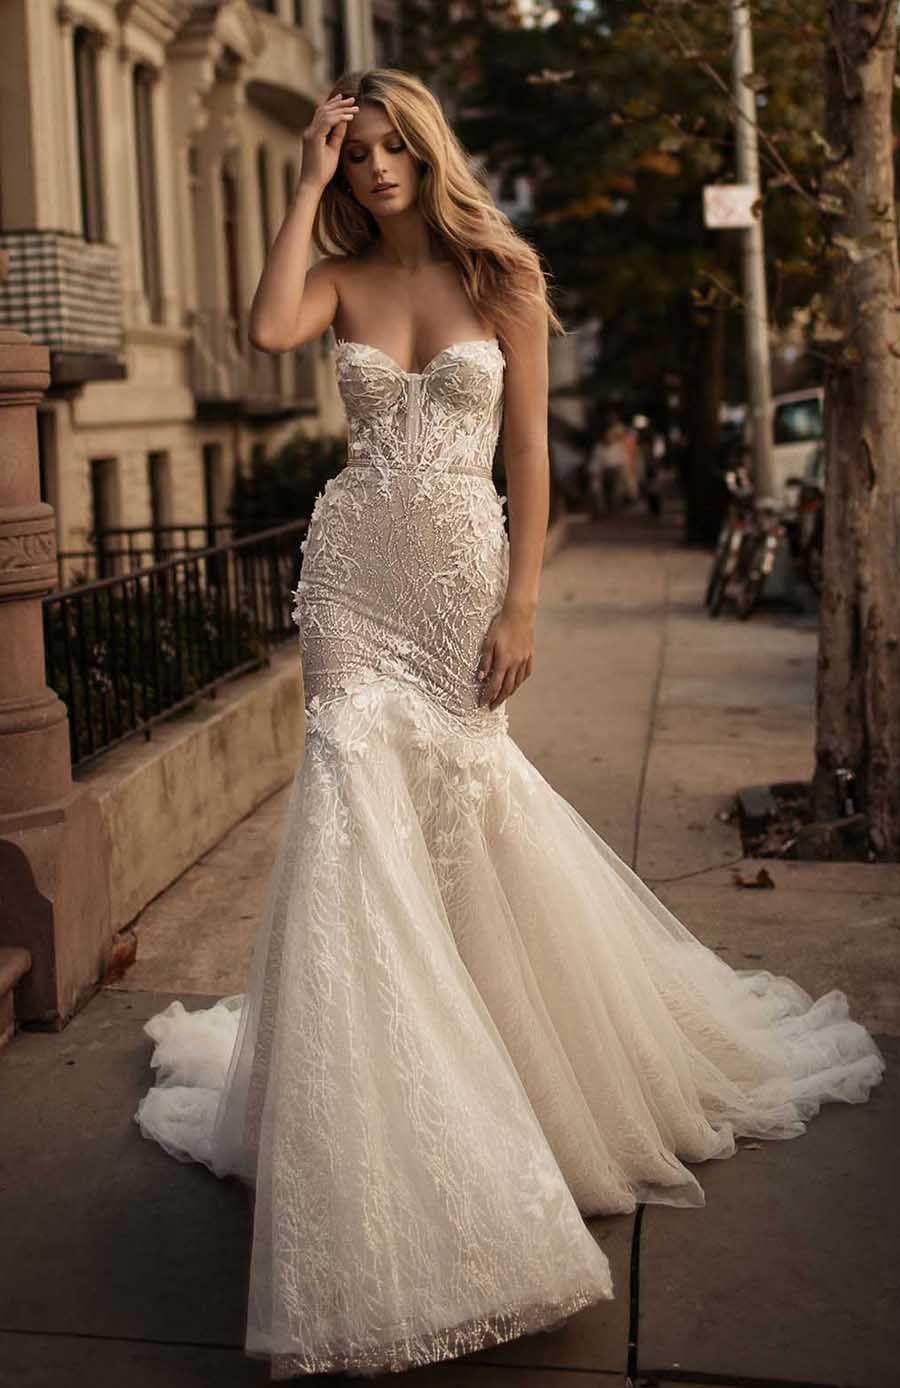 2017 Berta Bridal Corset Wedding Dresses Sweetheart Neckline Bustier ...